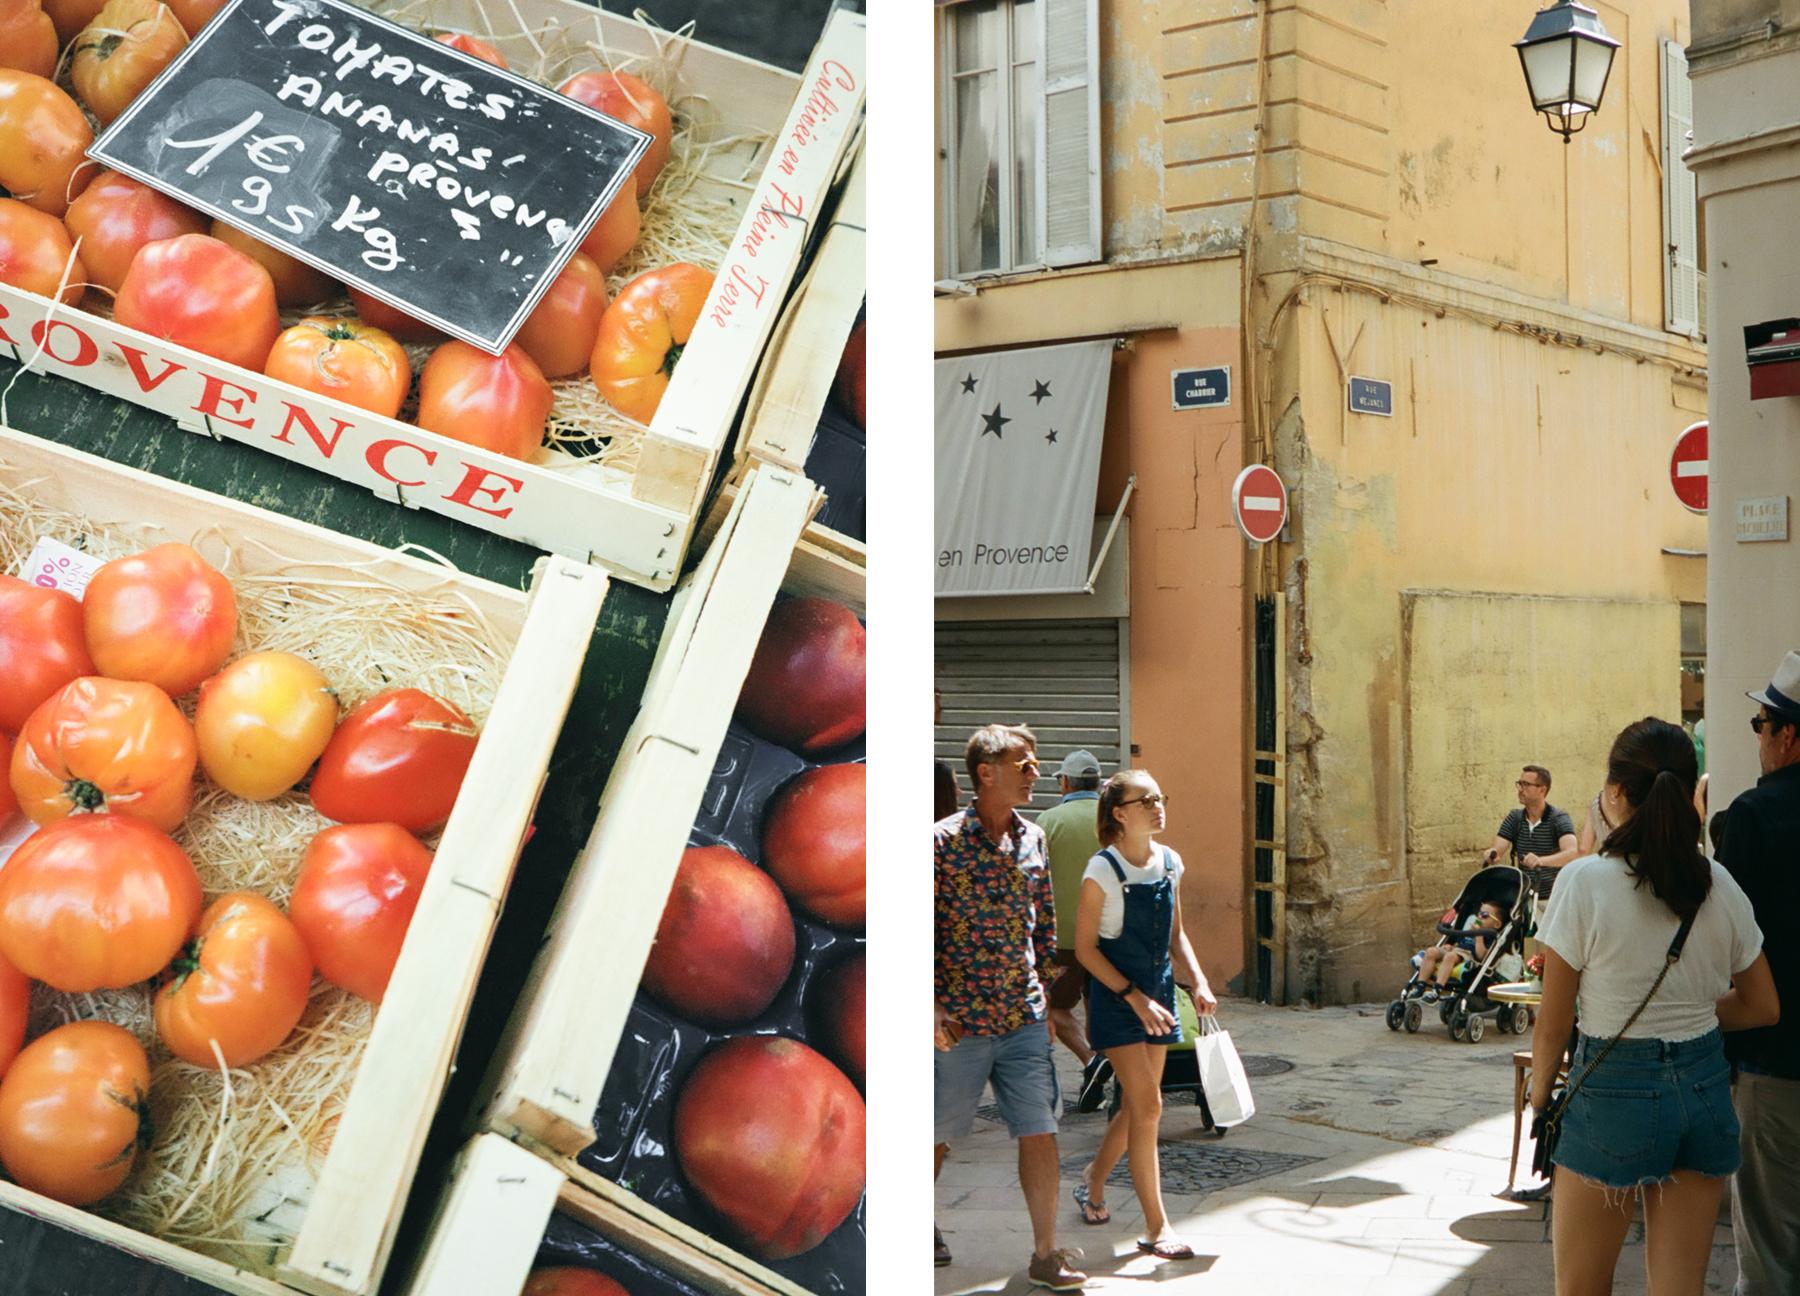 Aix_En_Provence_Carin_Olsson_06.jpg